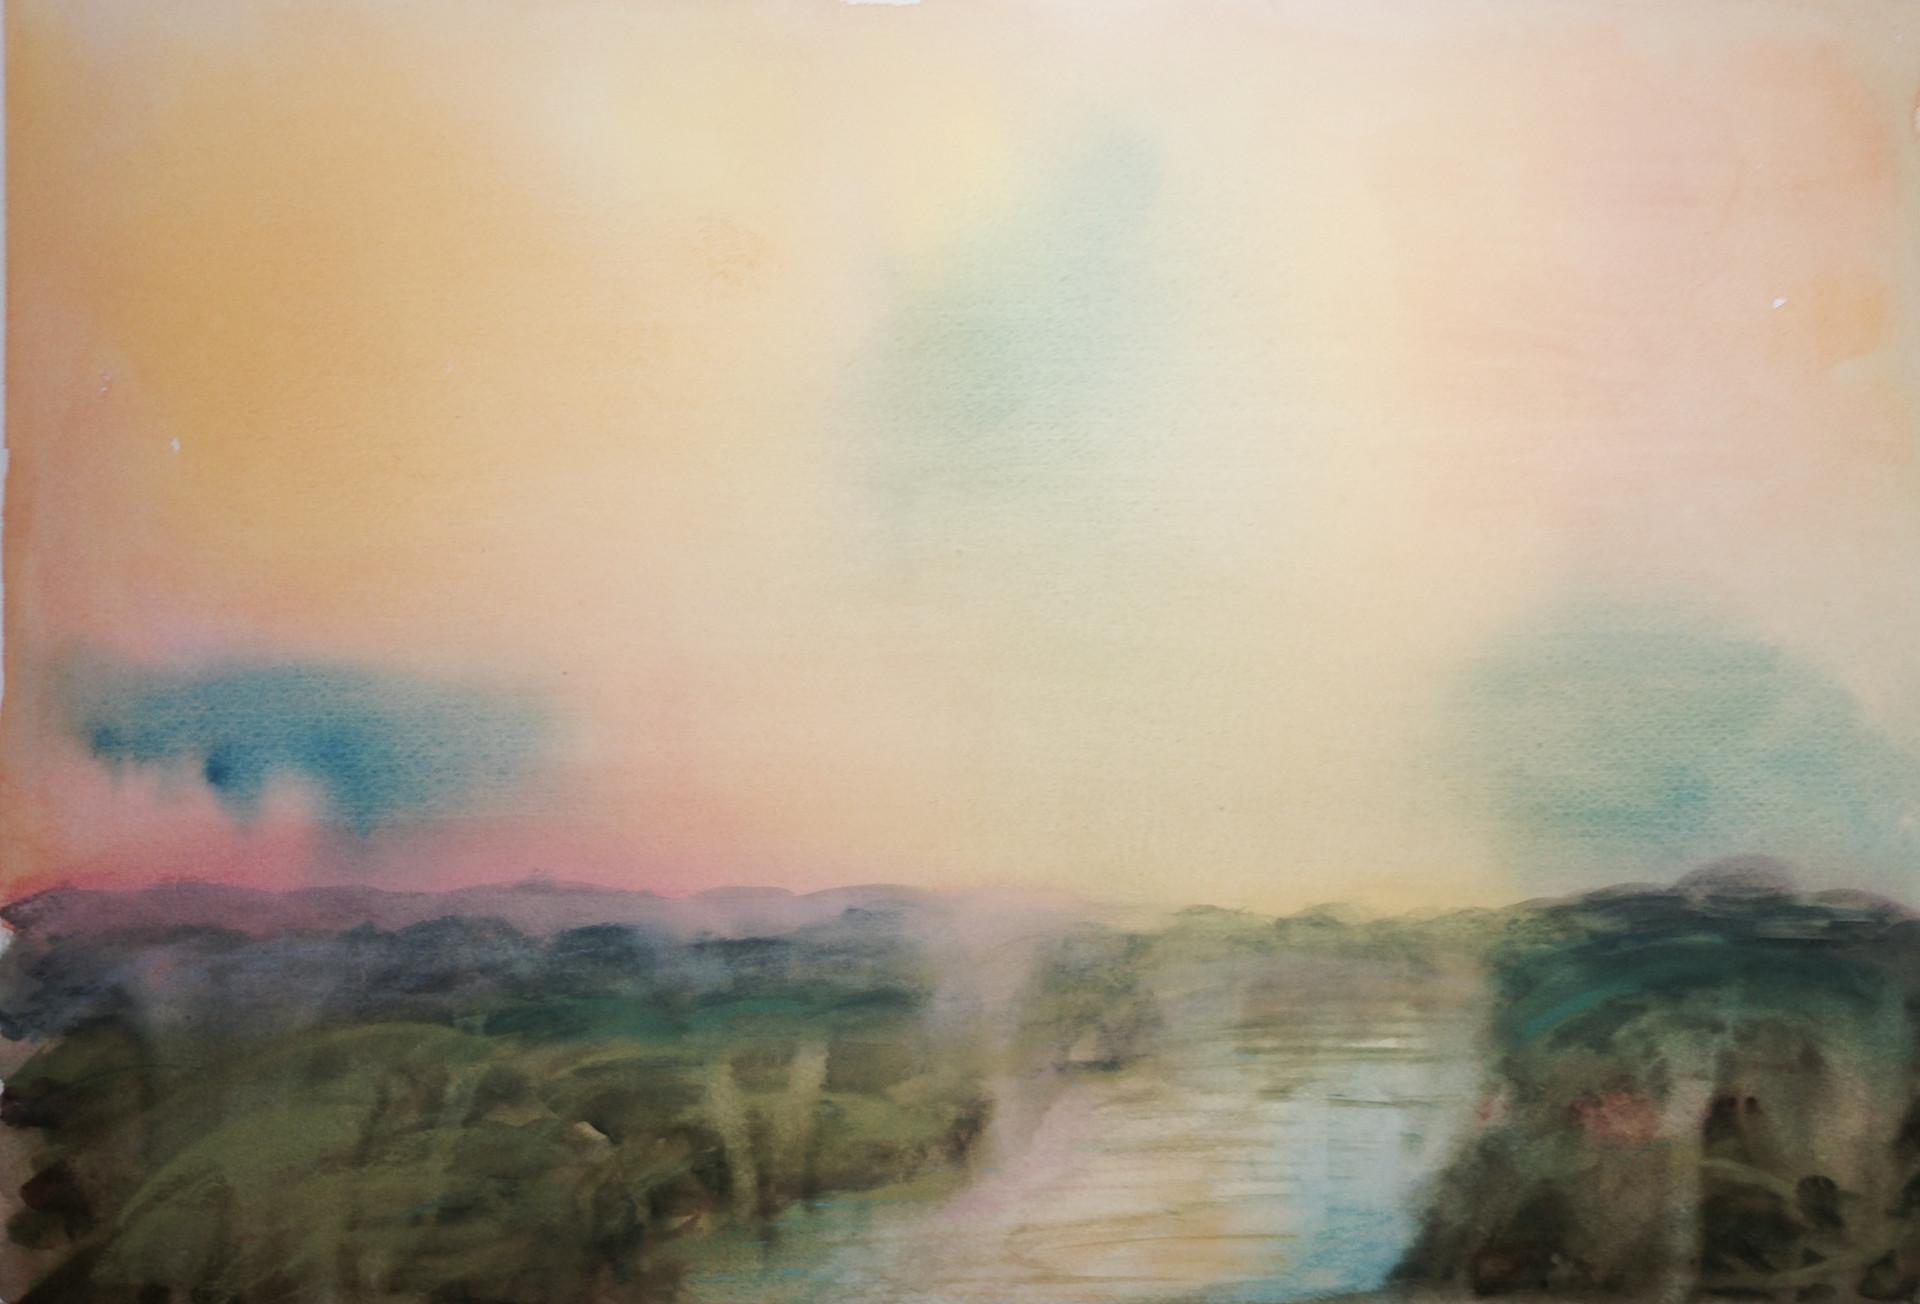 Imagined Landscape II